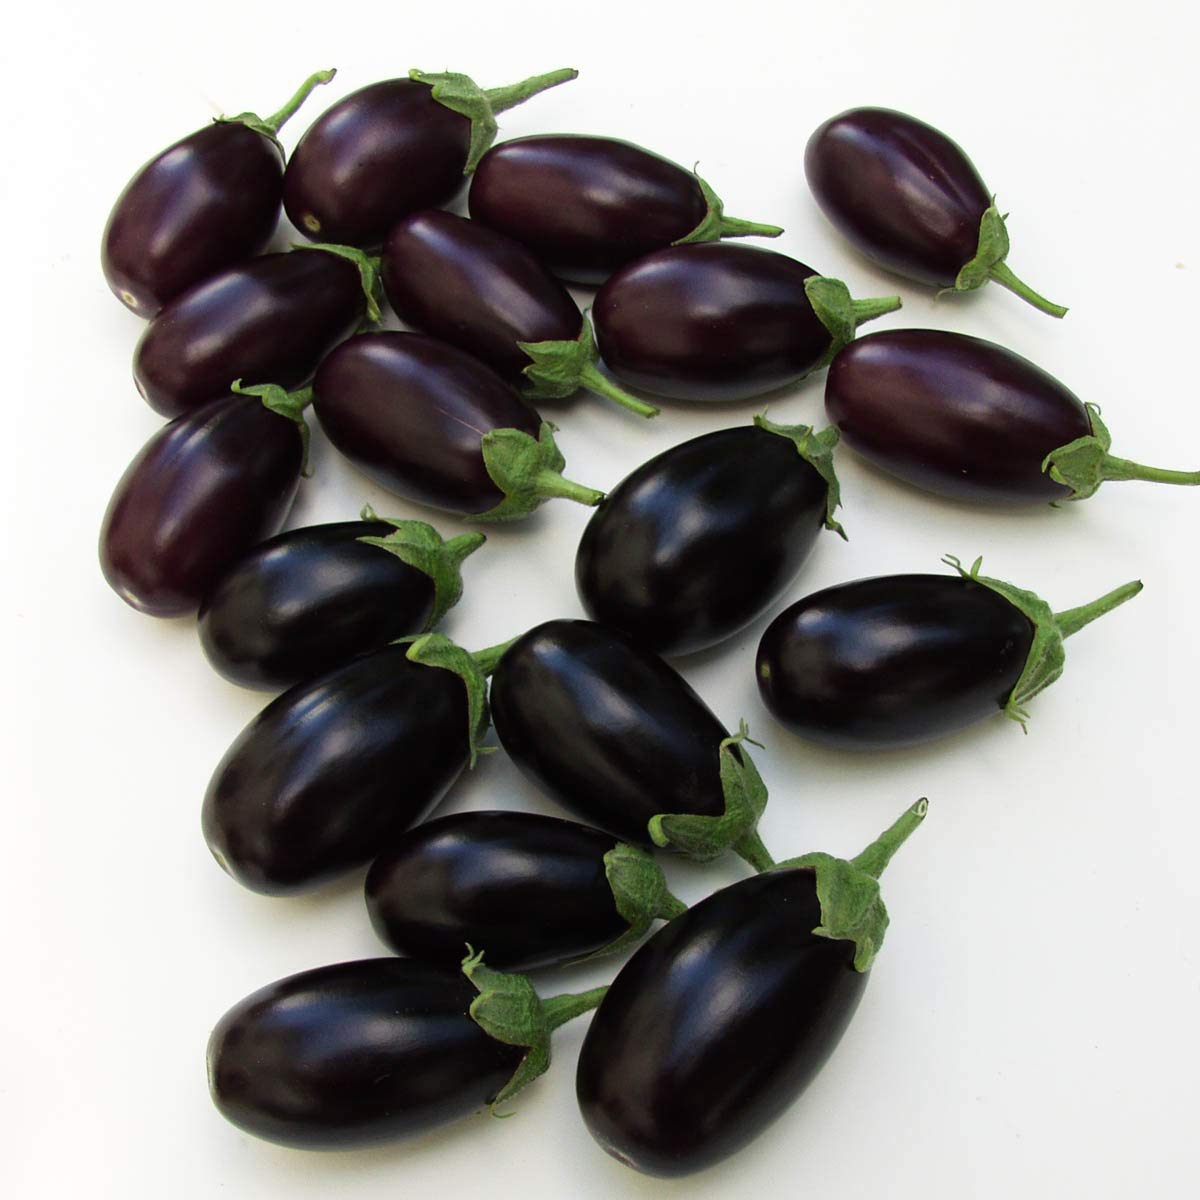 Mini Aubergine     Solanum melongena   Gemüse Pflanzen   4stk.